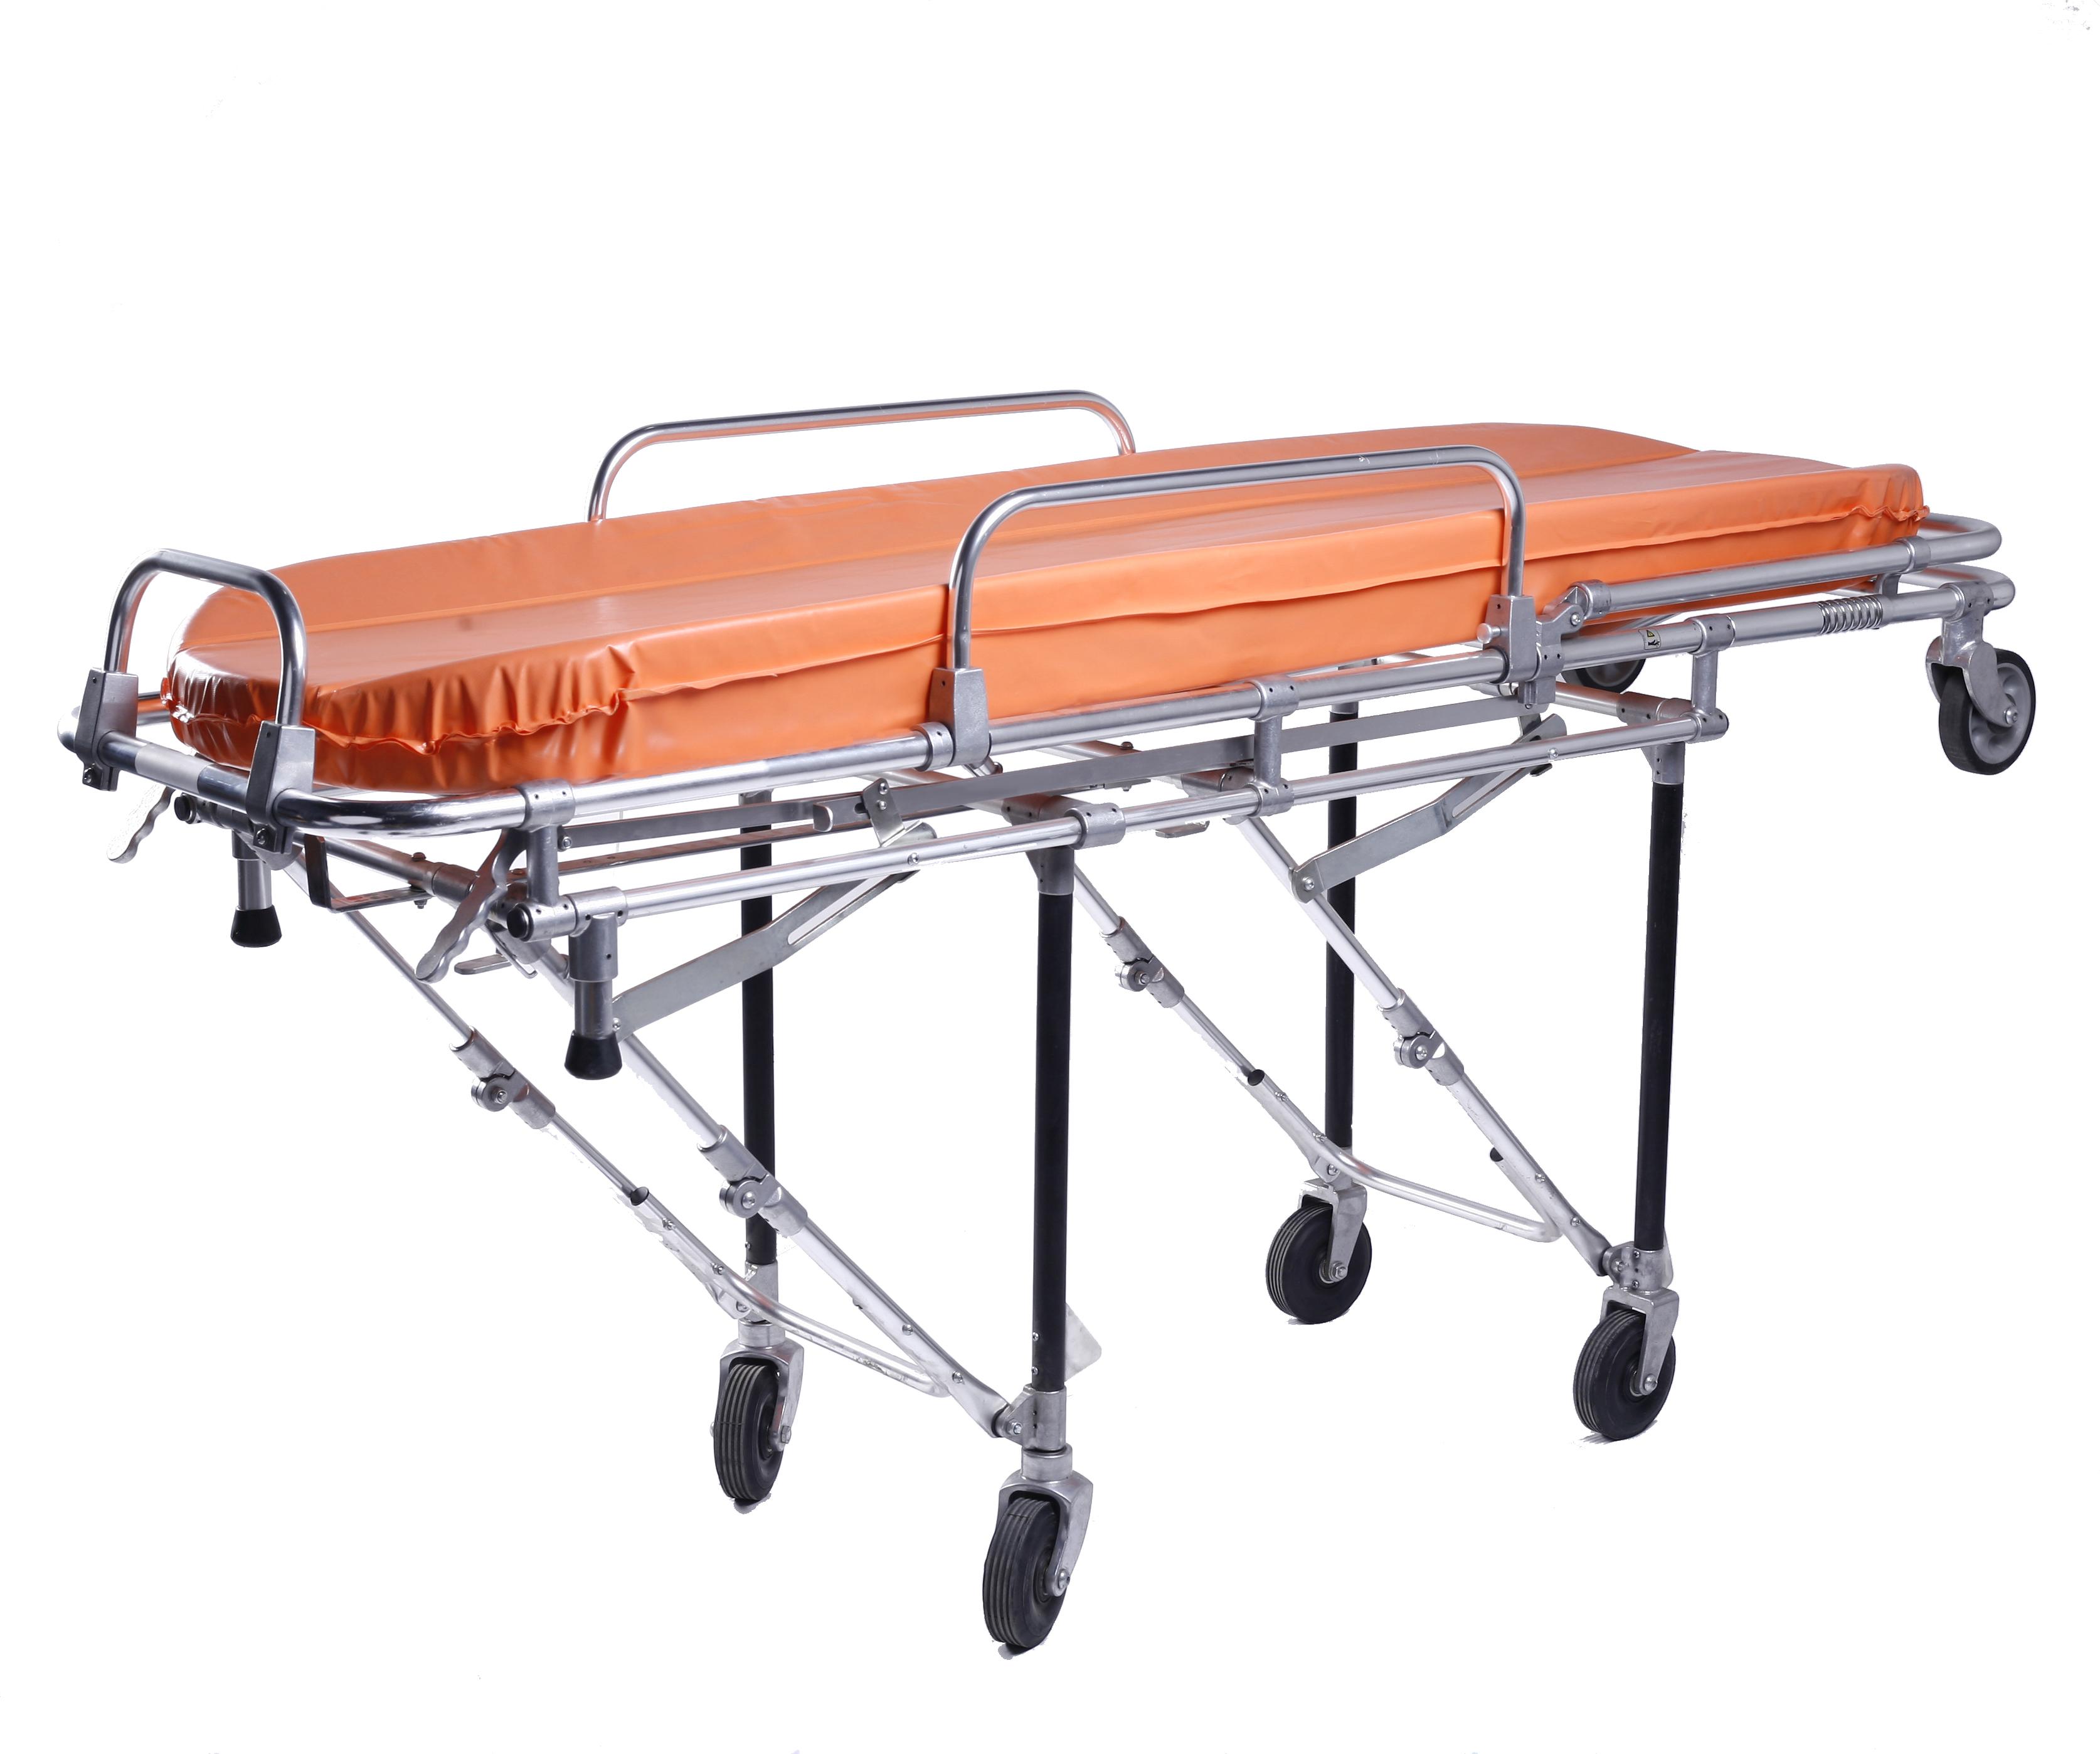 High quality used Ambulance stretcher dimensions - Buy Ambulance ...